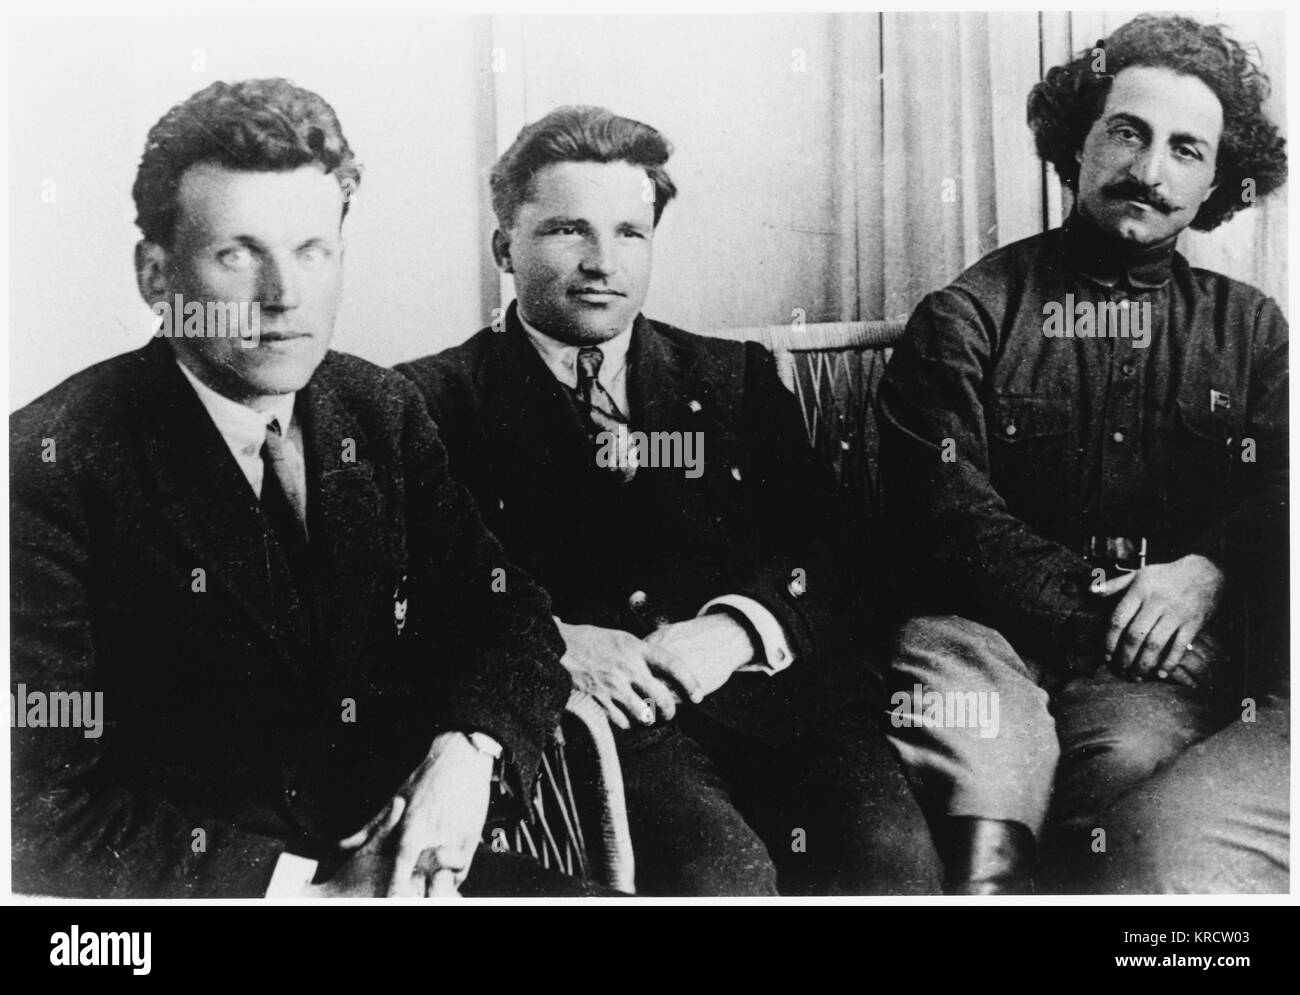 Sergey Mironovich Kirov (1886-1934), Russian Revolutionary leader (centre), with fellow-Bolshevik, Fedor Raskolnikov - Stock Image